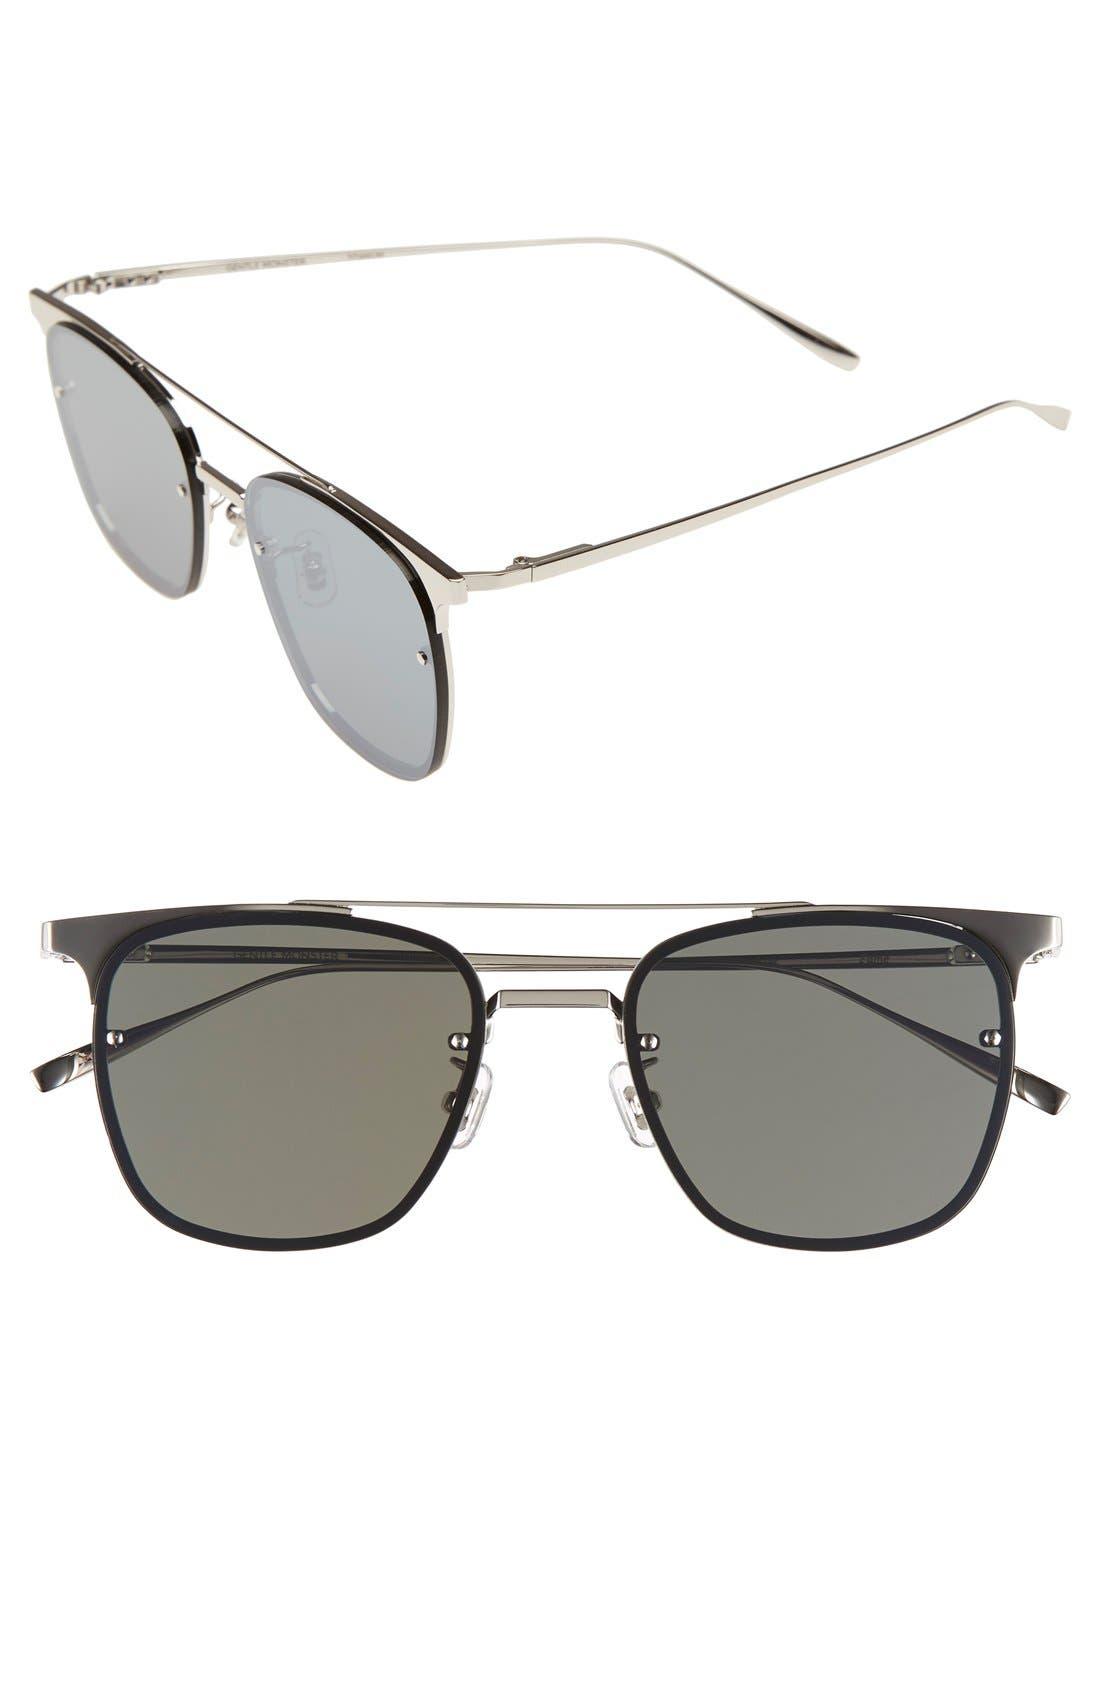 GENTLE MONSTER,                             'Fame' 55mm Retro Sunglasses,                             Main thumbnail 1, color,                             040